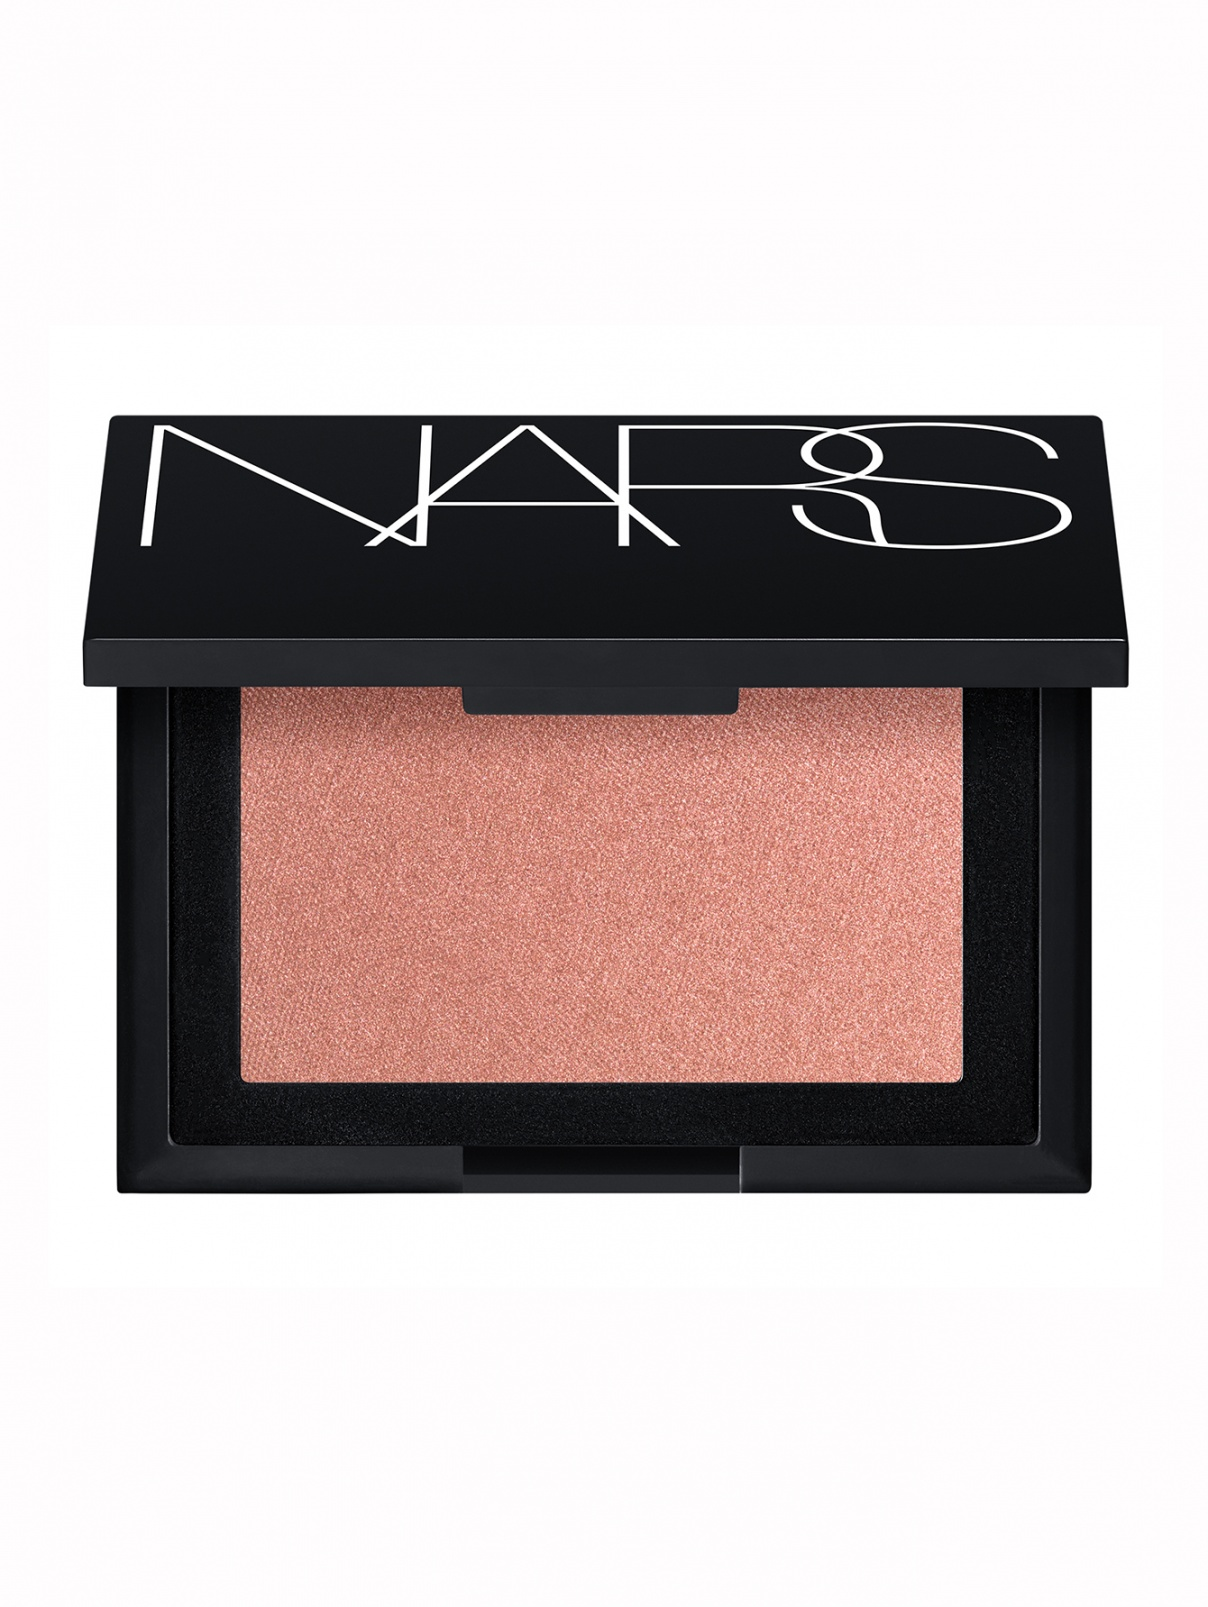 Пудра-хайлайтер MALDIVES Makeup NARS  –  Общий вид